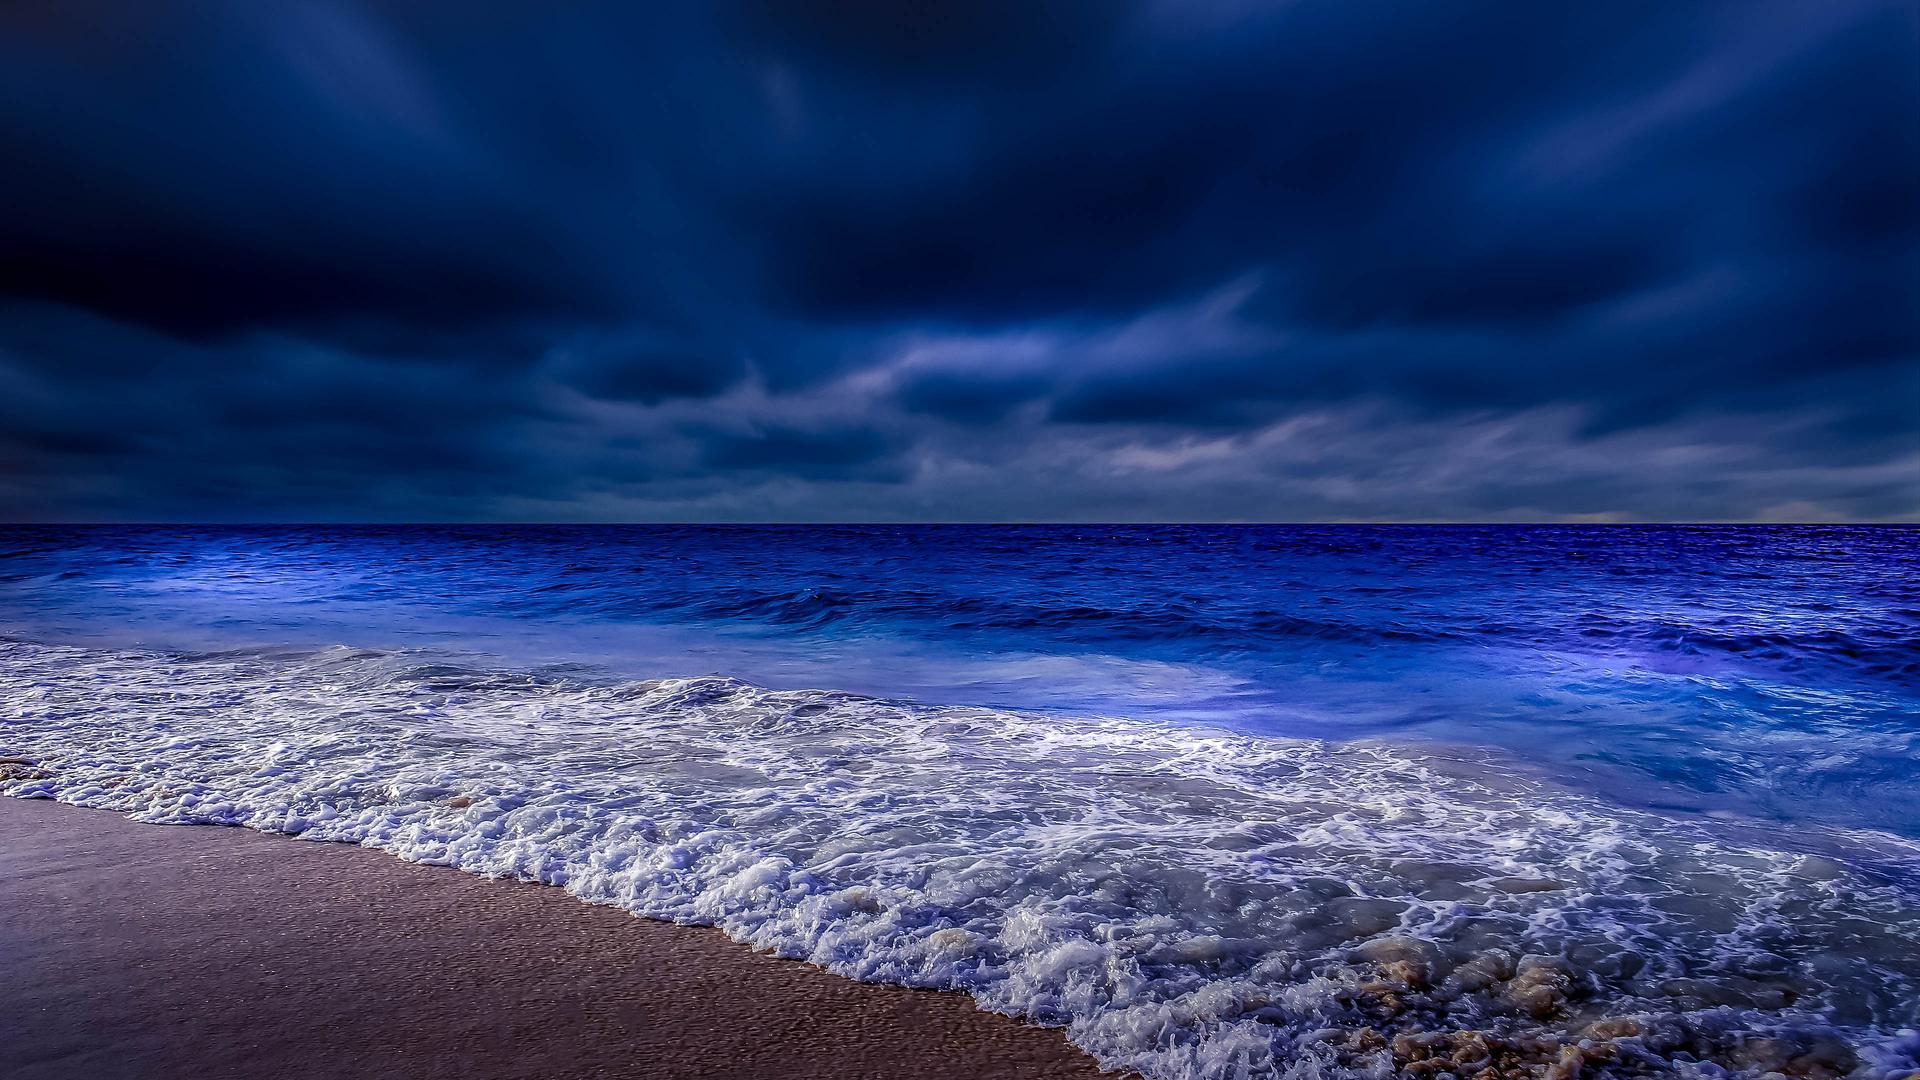 1920x1080 Sea Shore Waves At Night Time 4k Laptop Full HD ...